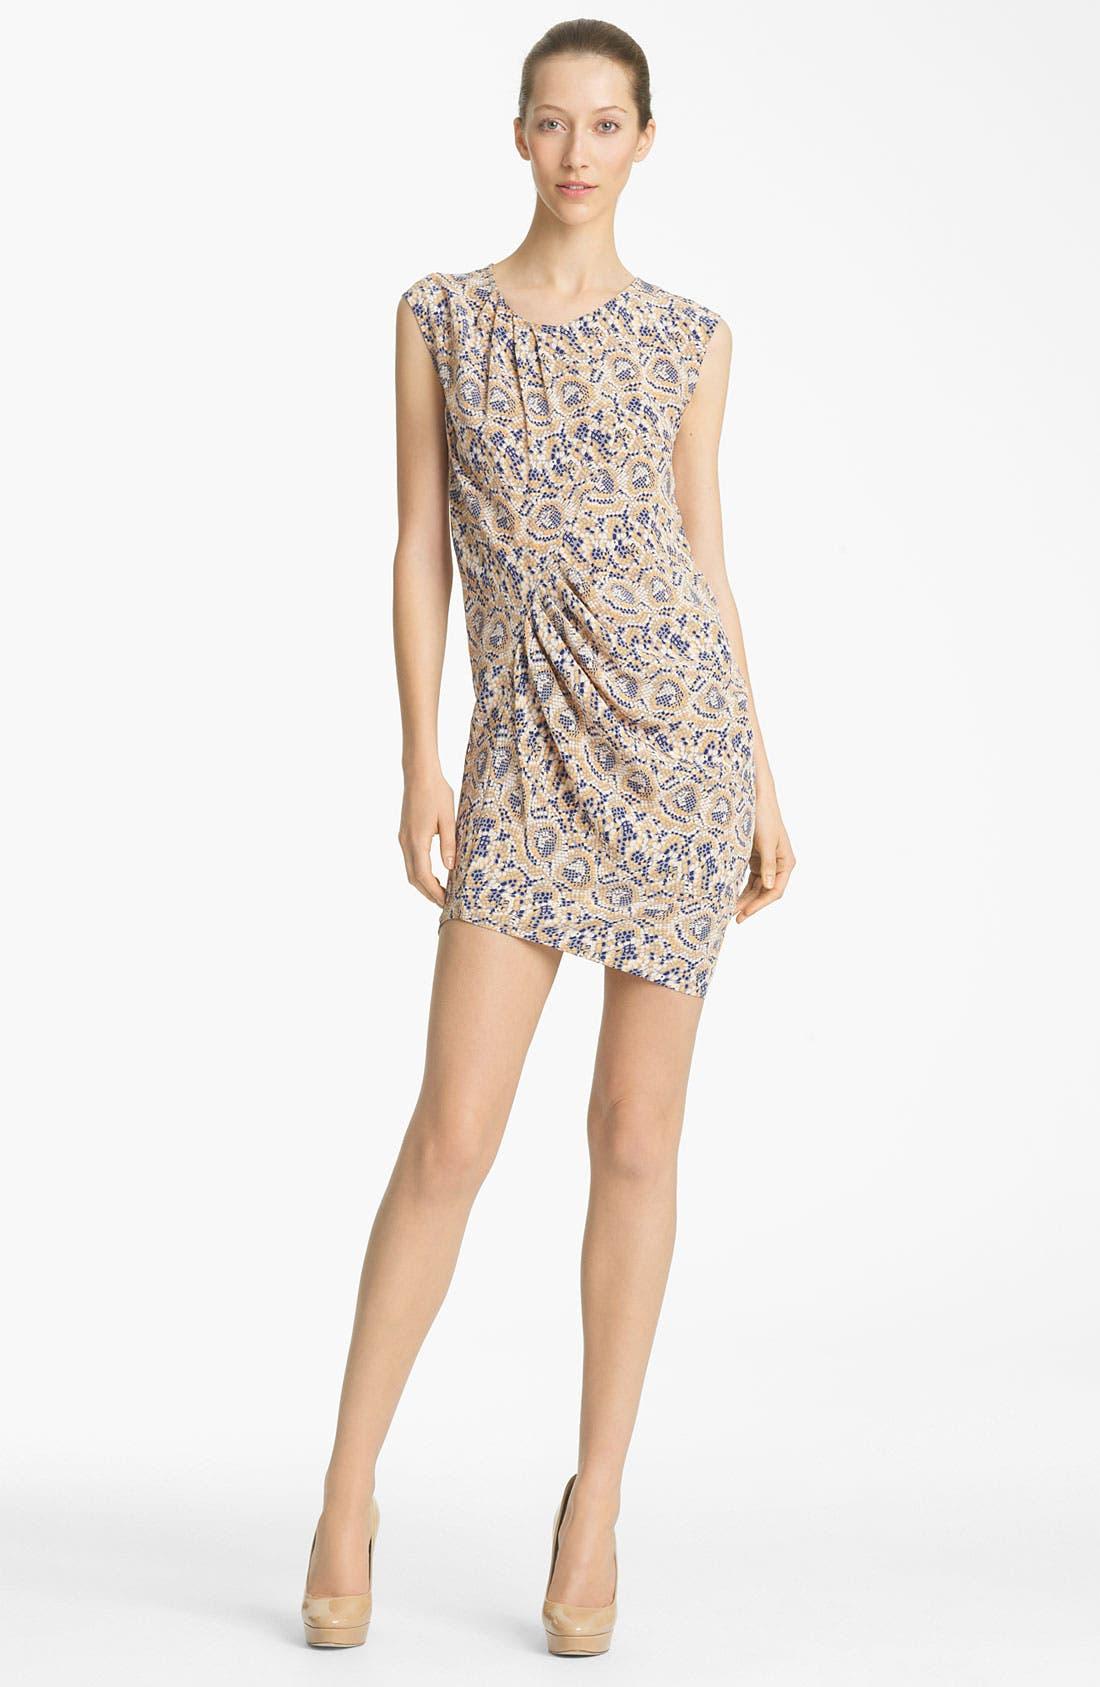 Alternate Image 1 Selected - Thakoon Mosaic Print Silk Dress